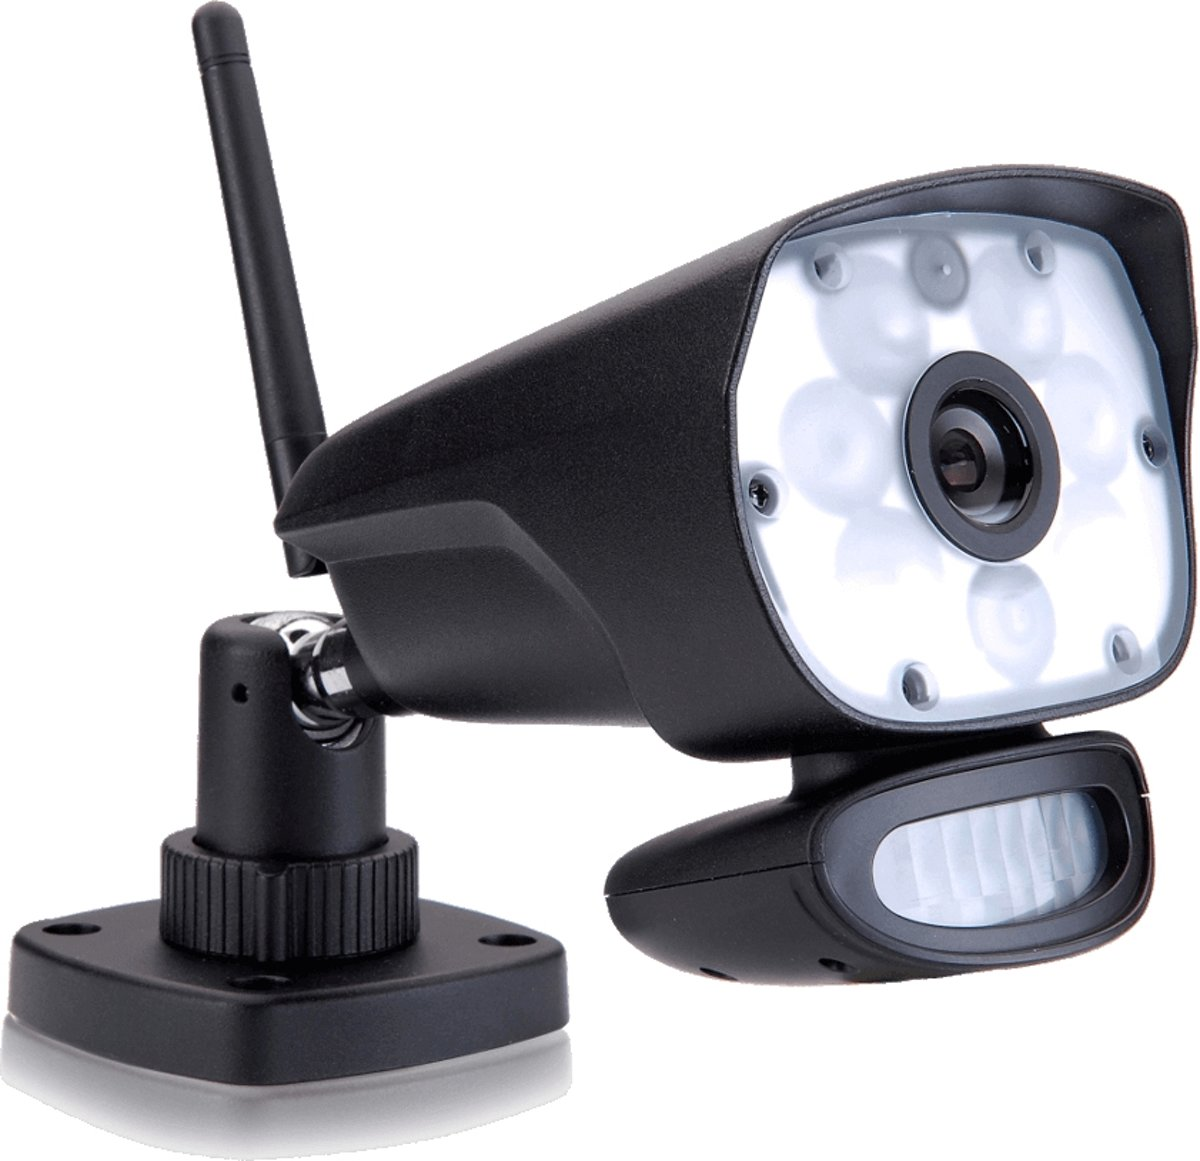 Hardware Beveiligingscamera